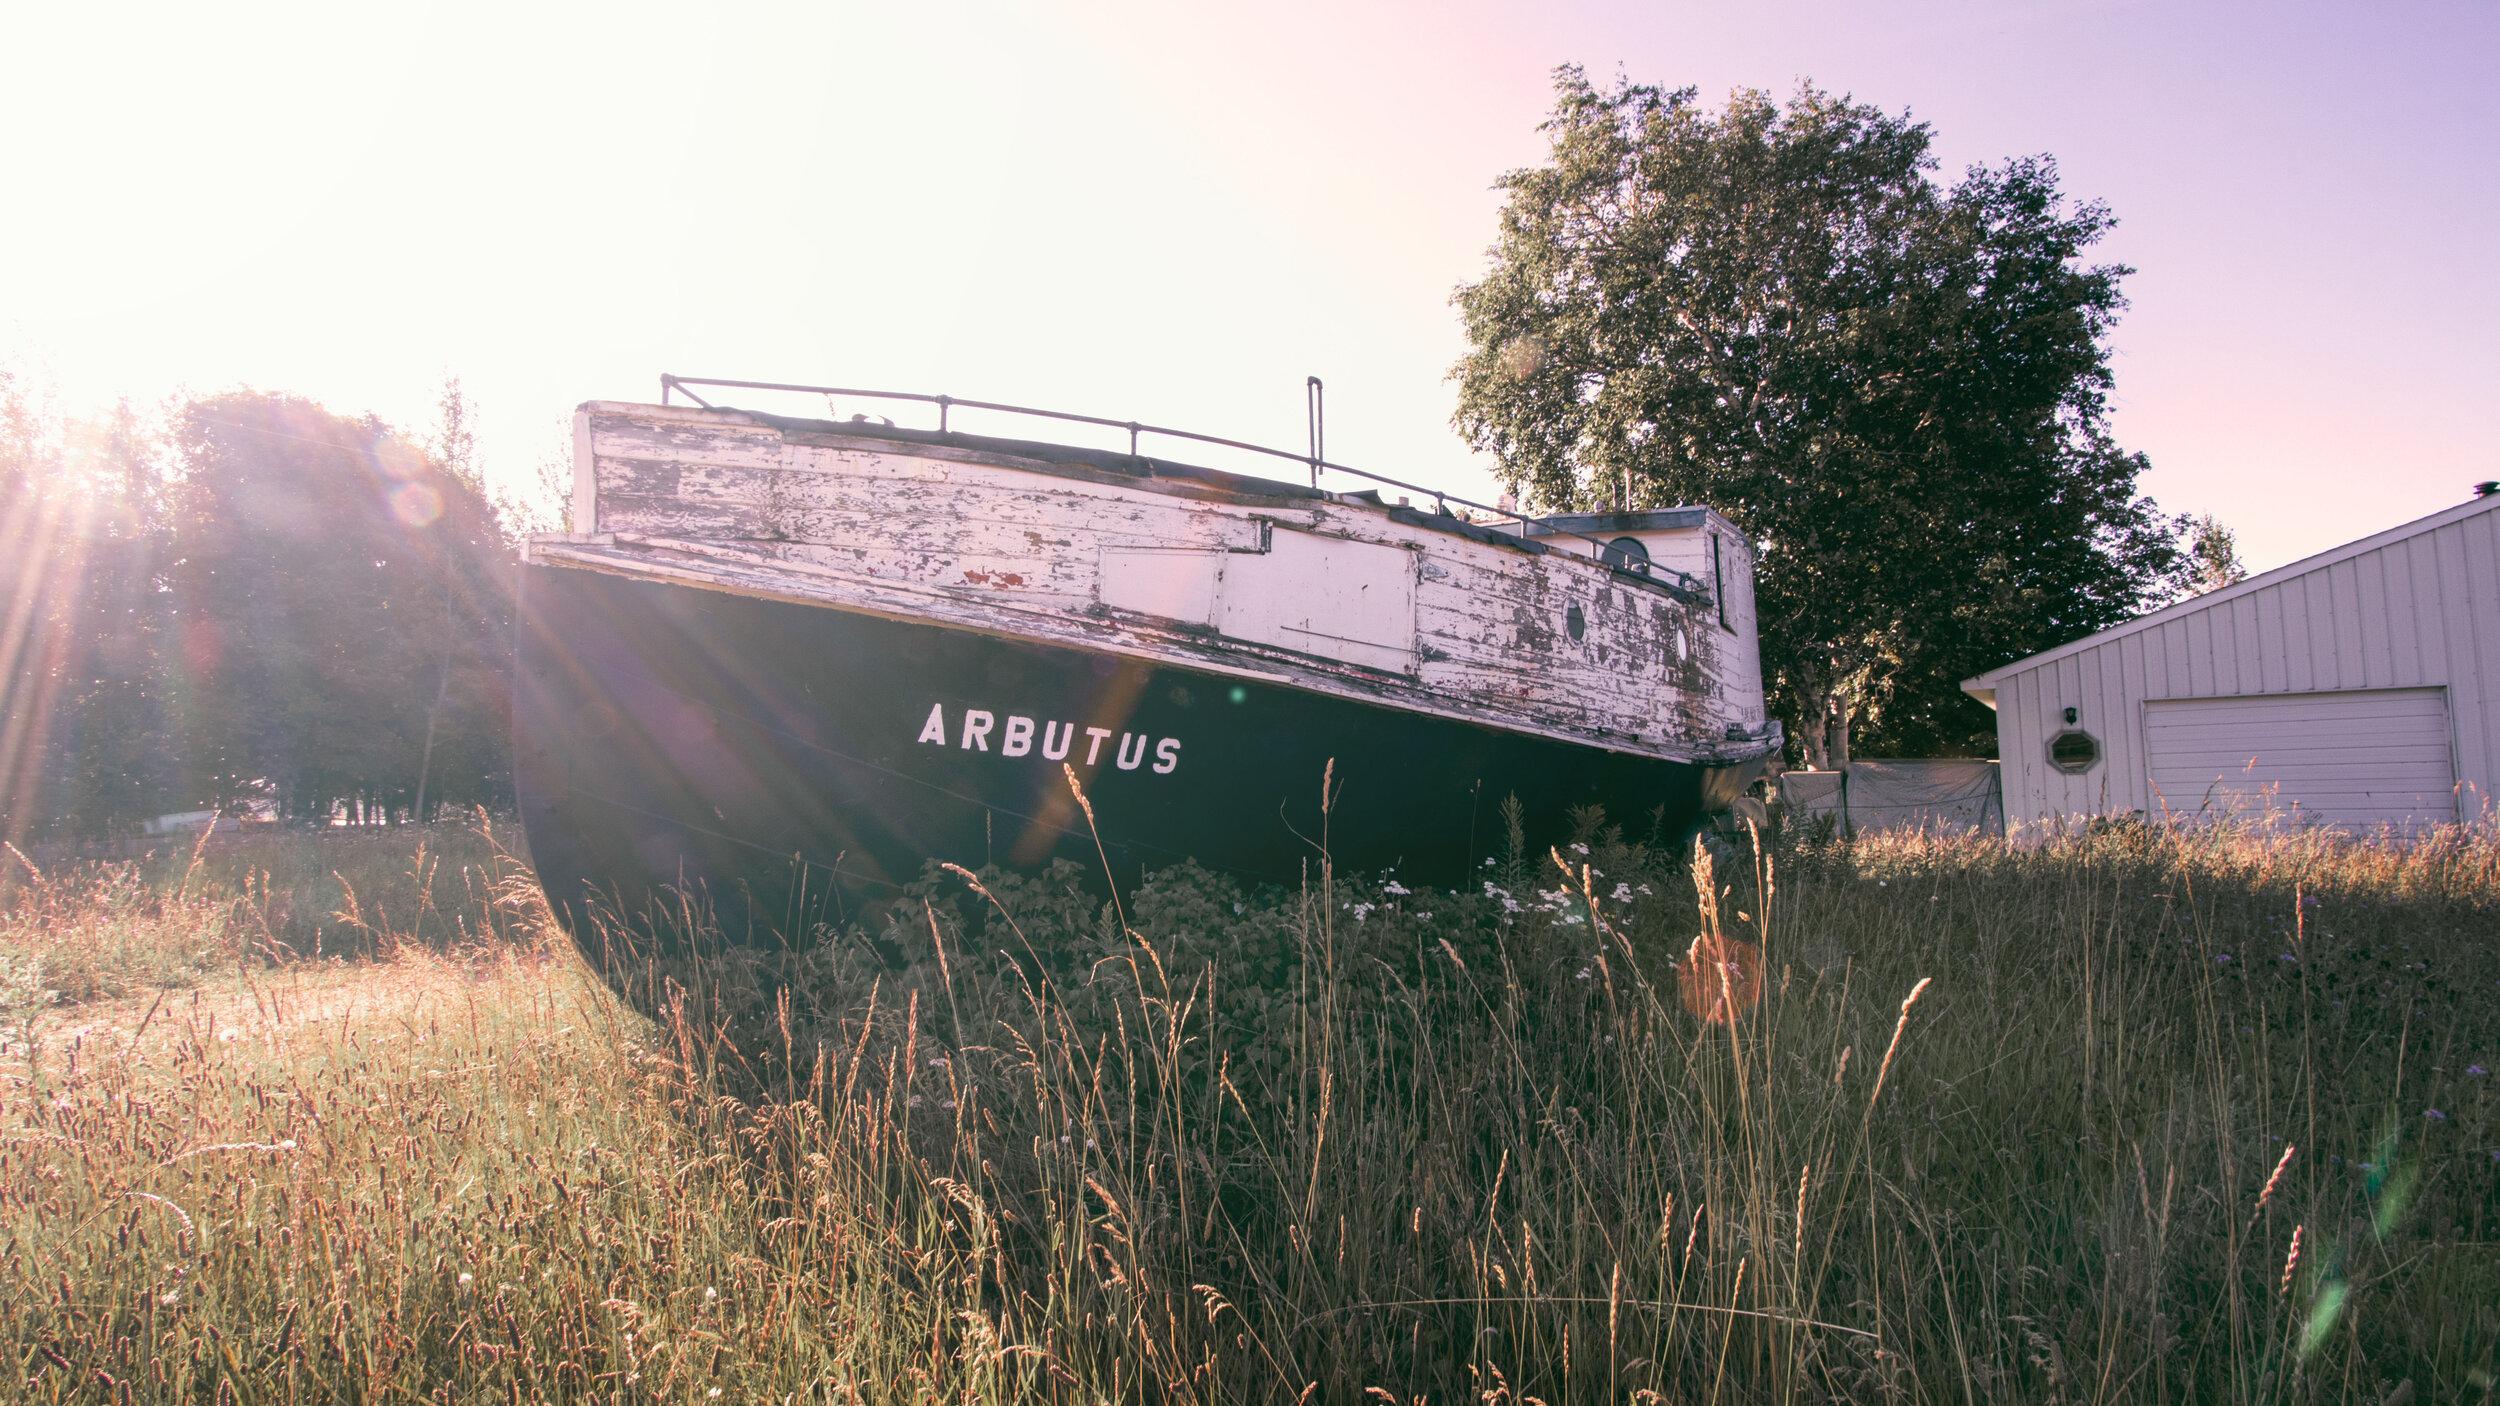 Arbutus, Grand Marais, Michigan, 08.20.2019